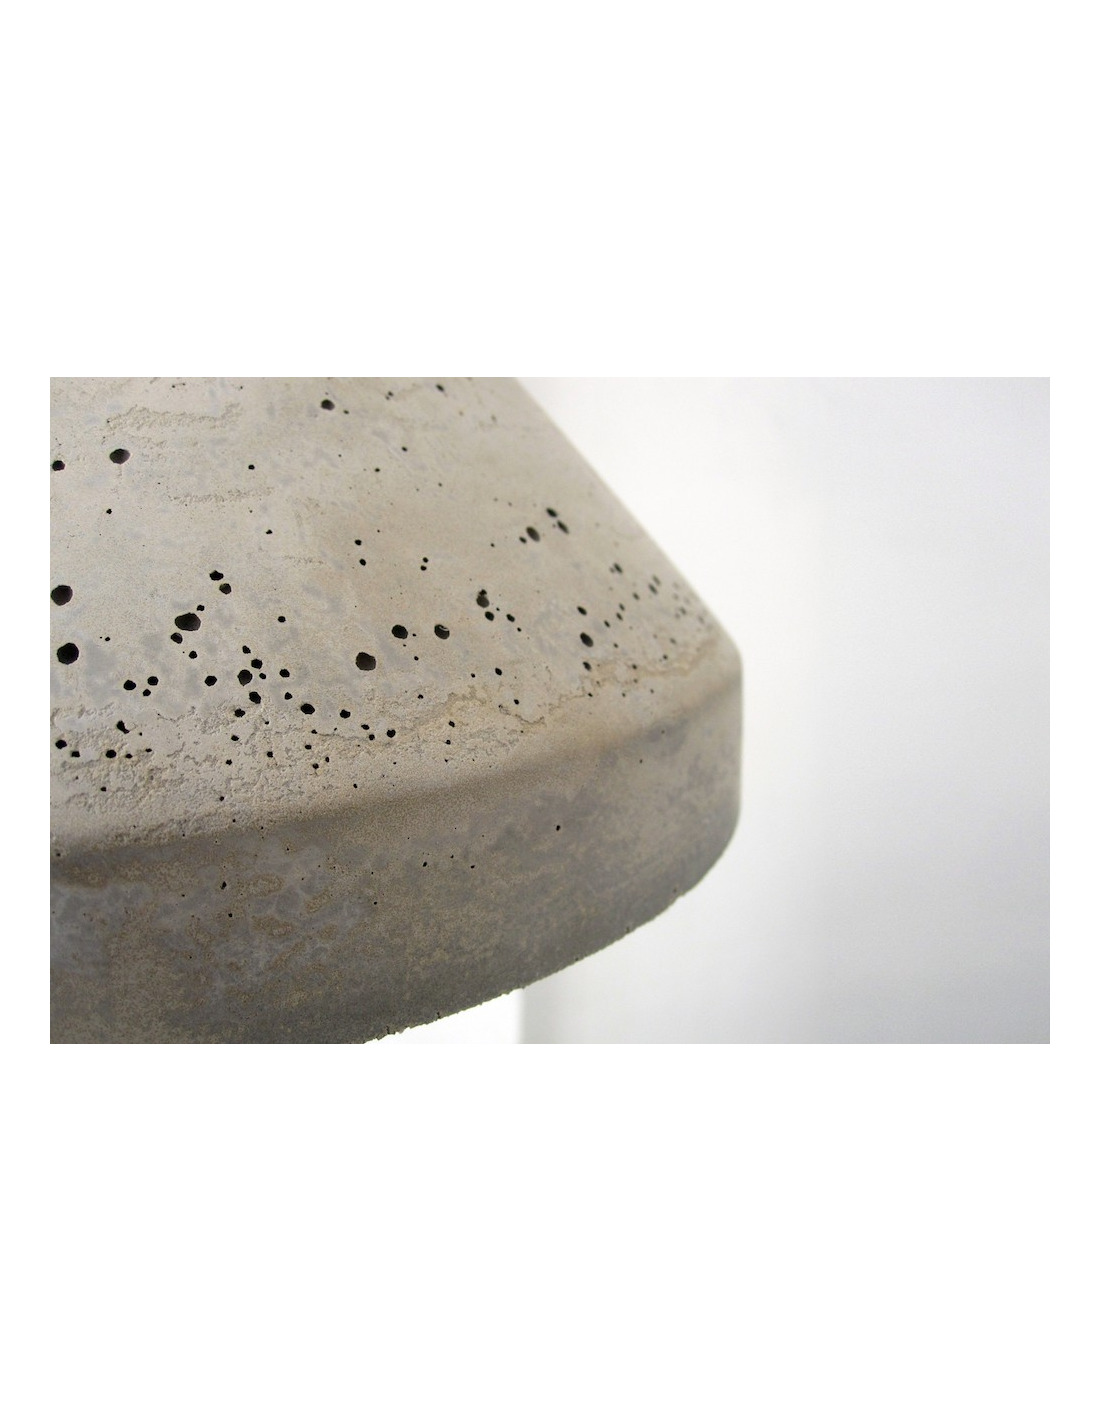 suspension en b ton et bois design concrete lamp otoko. Black Bedroom Furniture Sets. Home Design Ideas